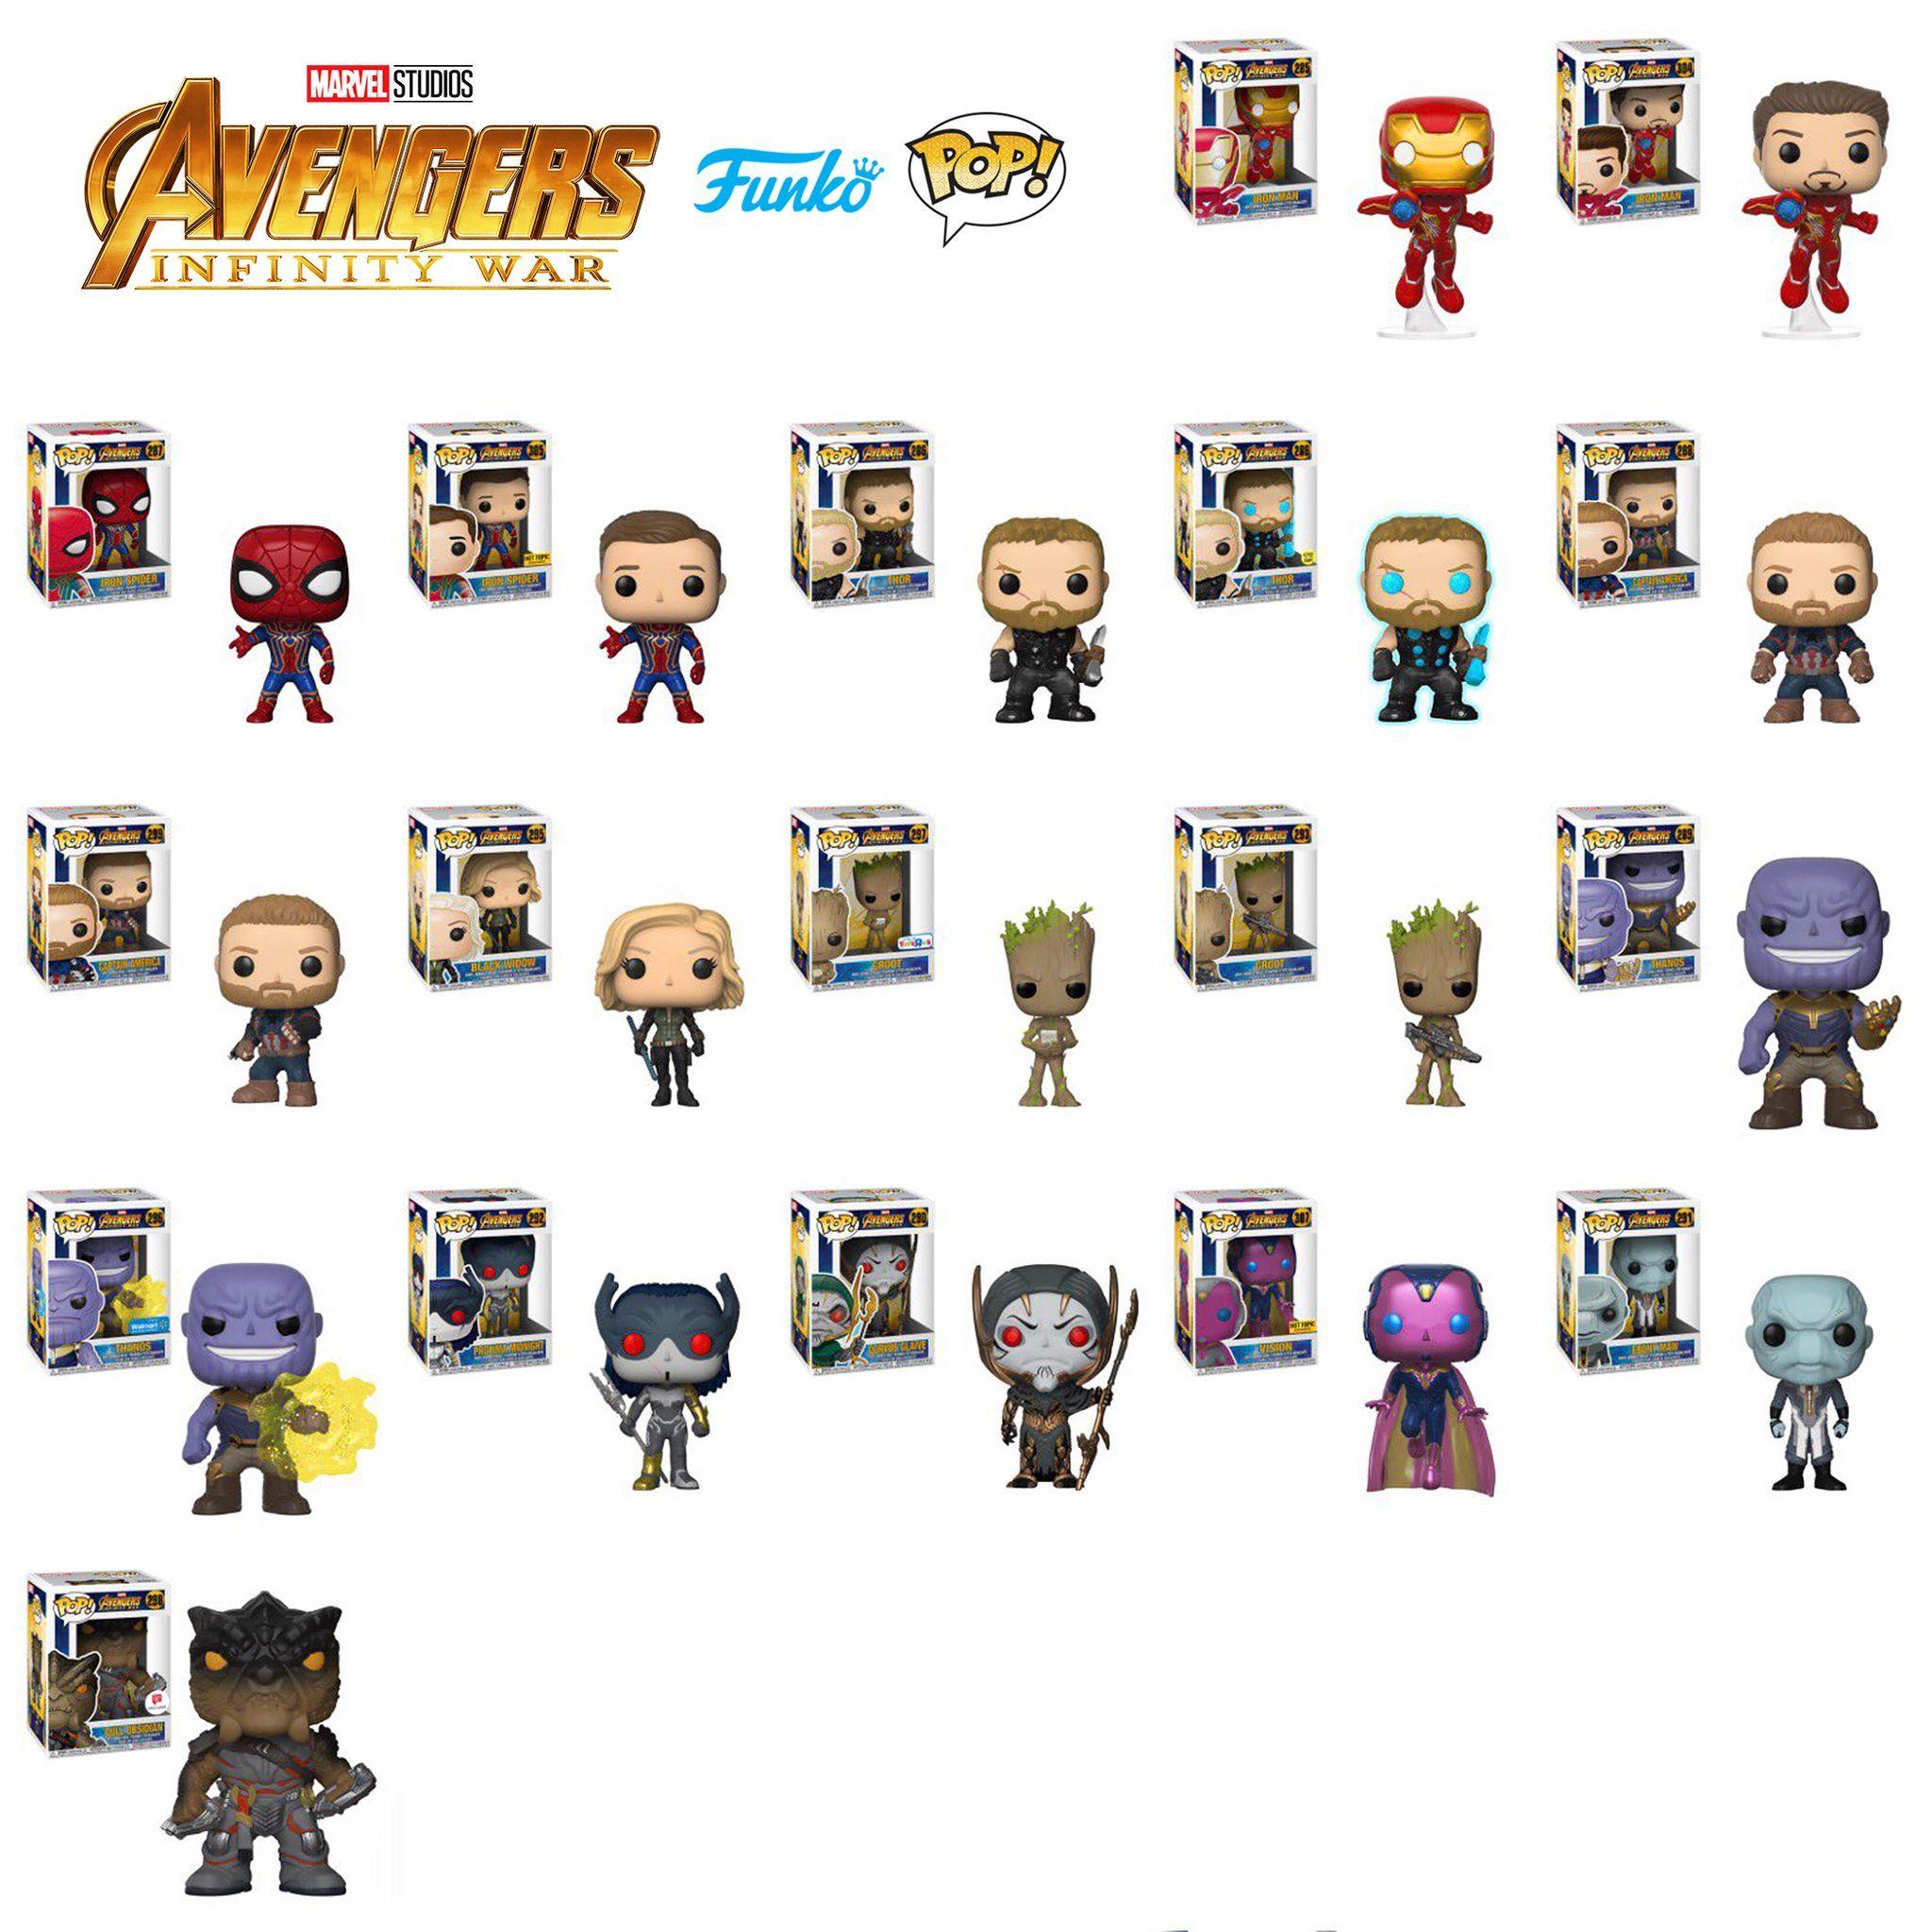 Avengers Infinity War Funko Pop Figures Revealed Vingadores Bonecos Funko Pop Funko Pop